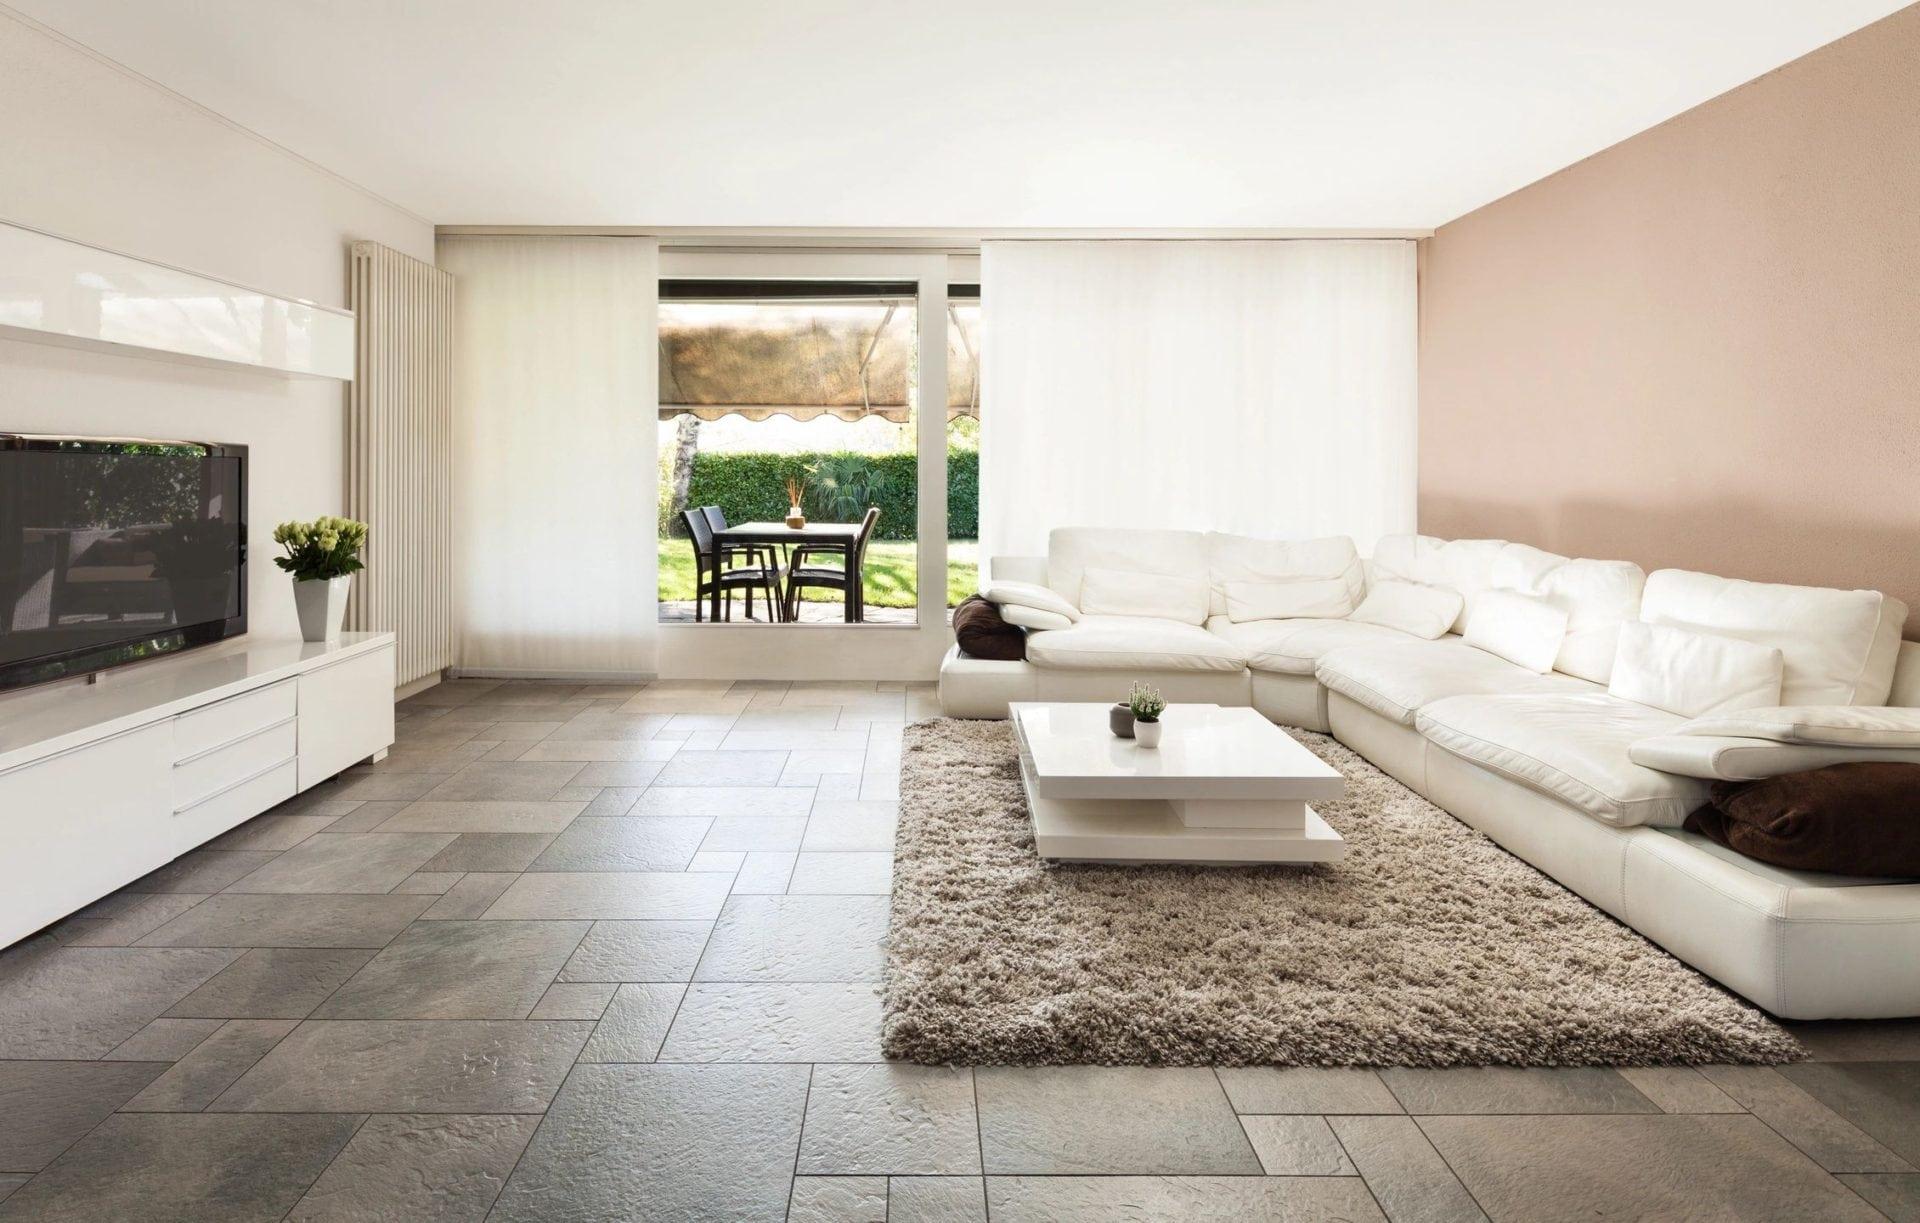 Huikkos Custom Tile and Flooring